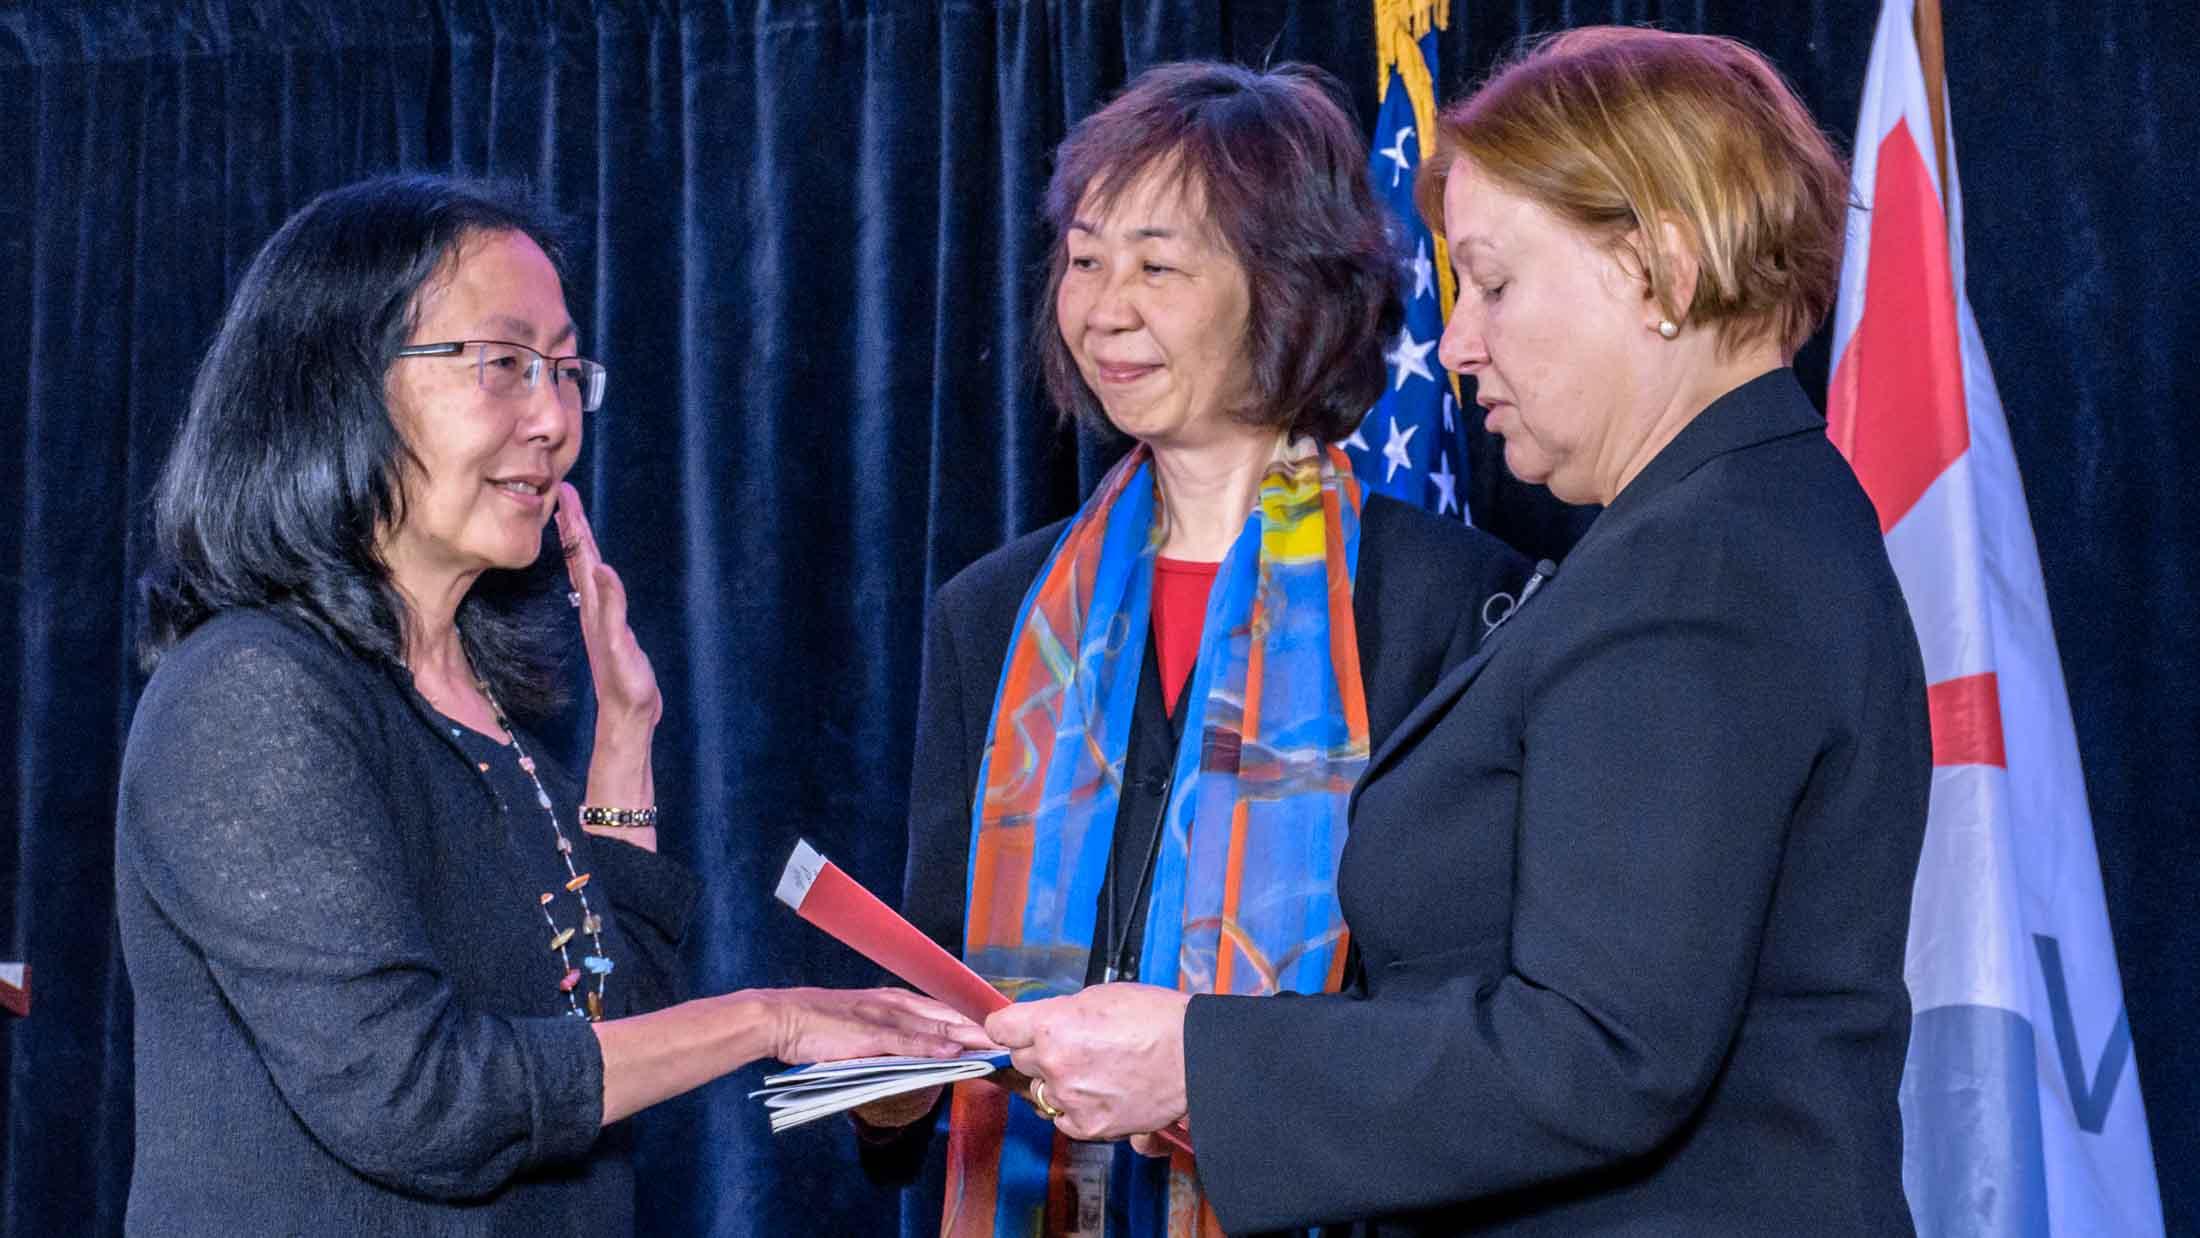 Sandy Sugawara sworn in as Voice of America Deputy Director